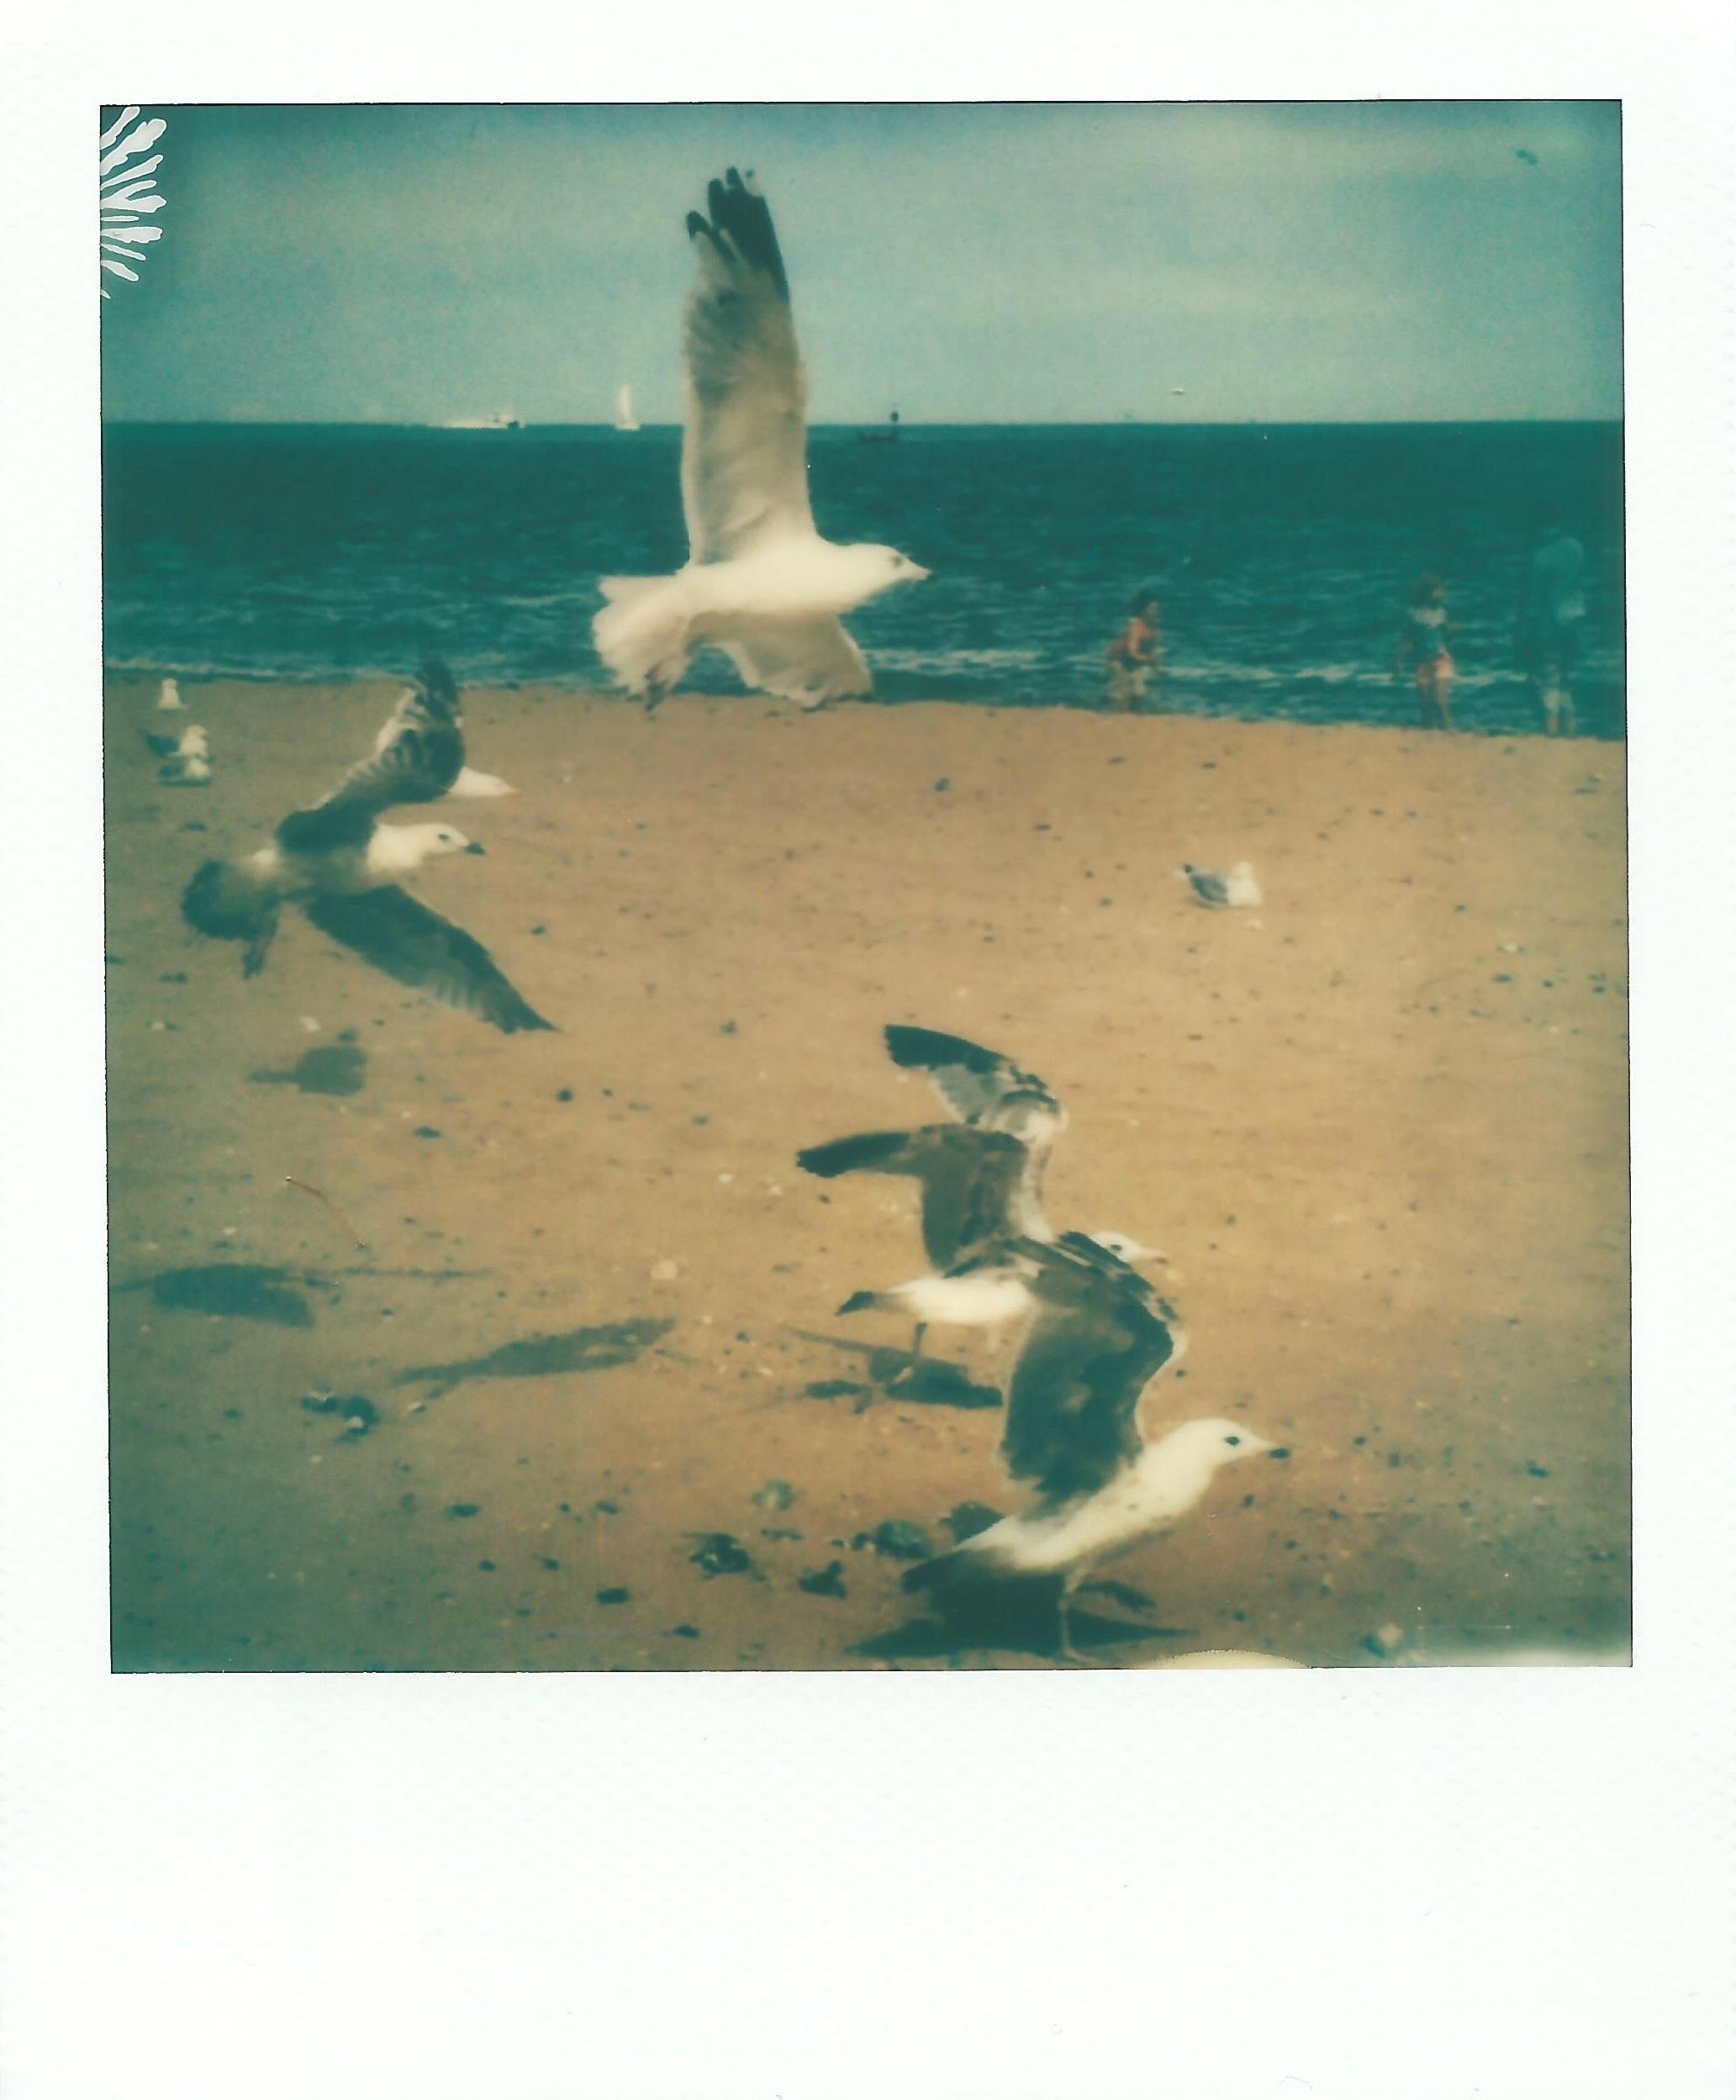 seagulls_ramsgate.jpg